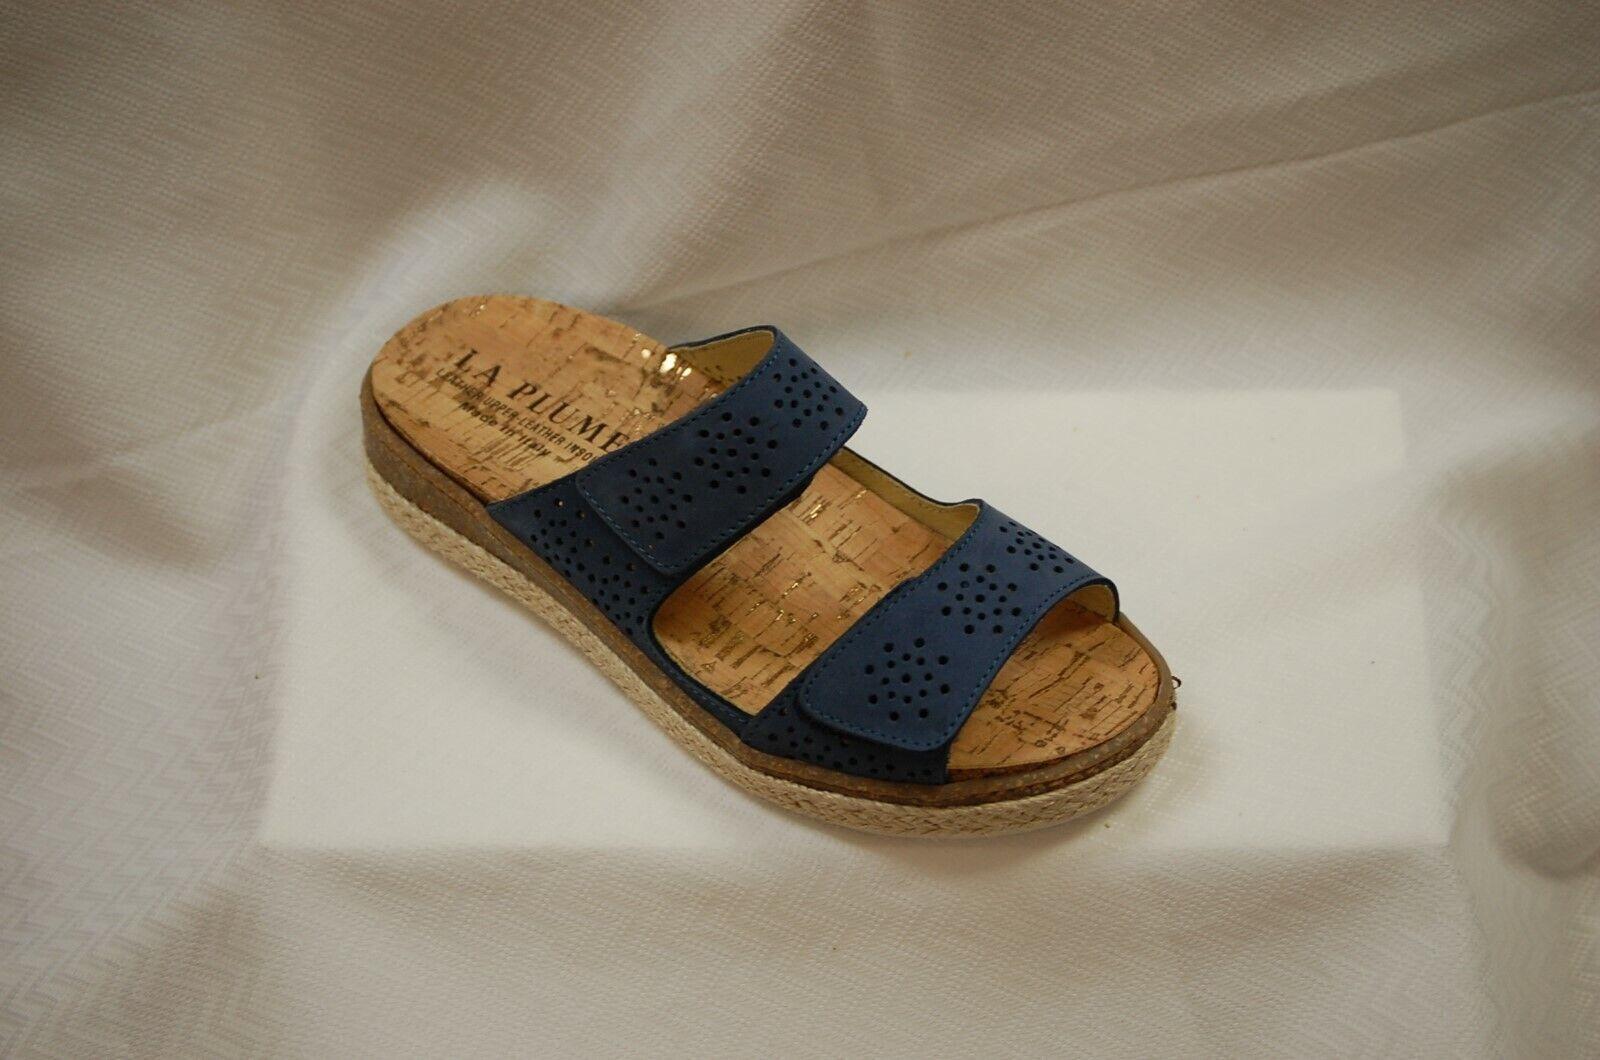 La Plume Meadow Slide Sandal Denim bluee Nubuk leather + + + removable insole size 38 07d798